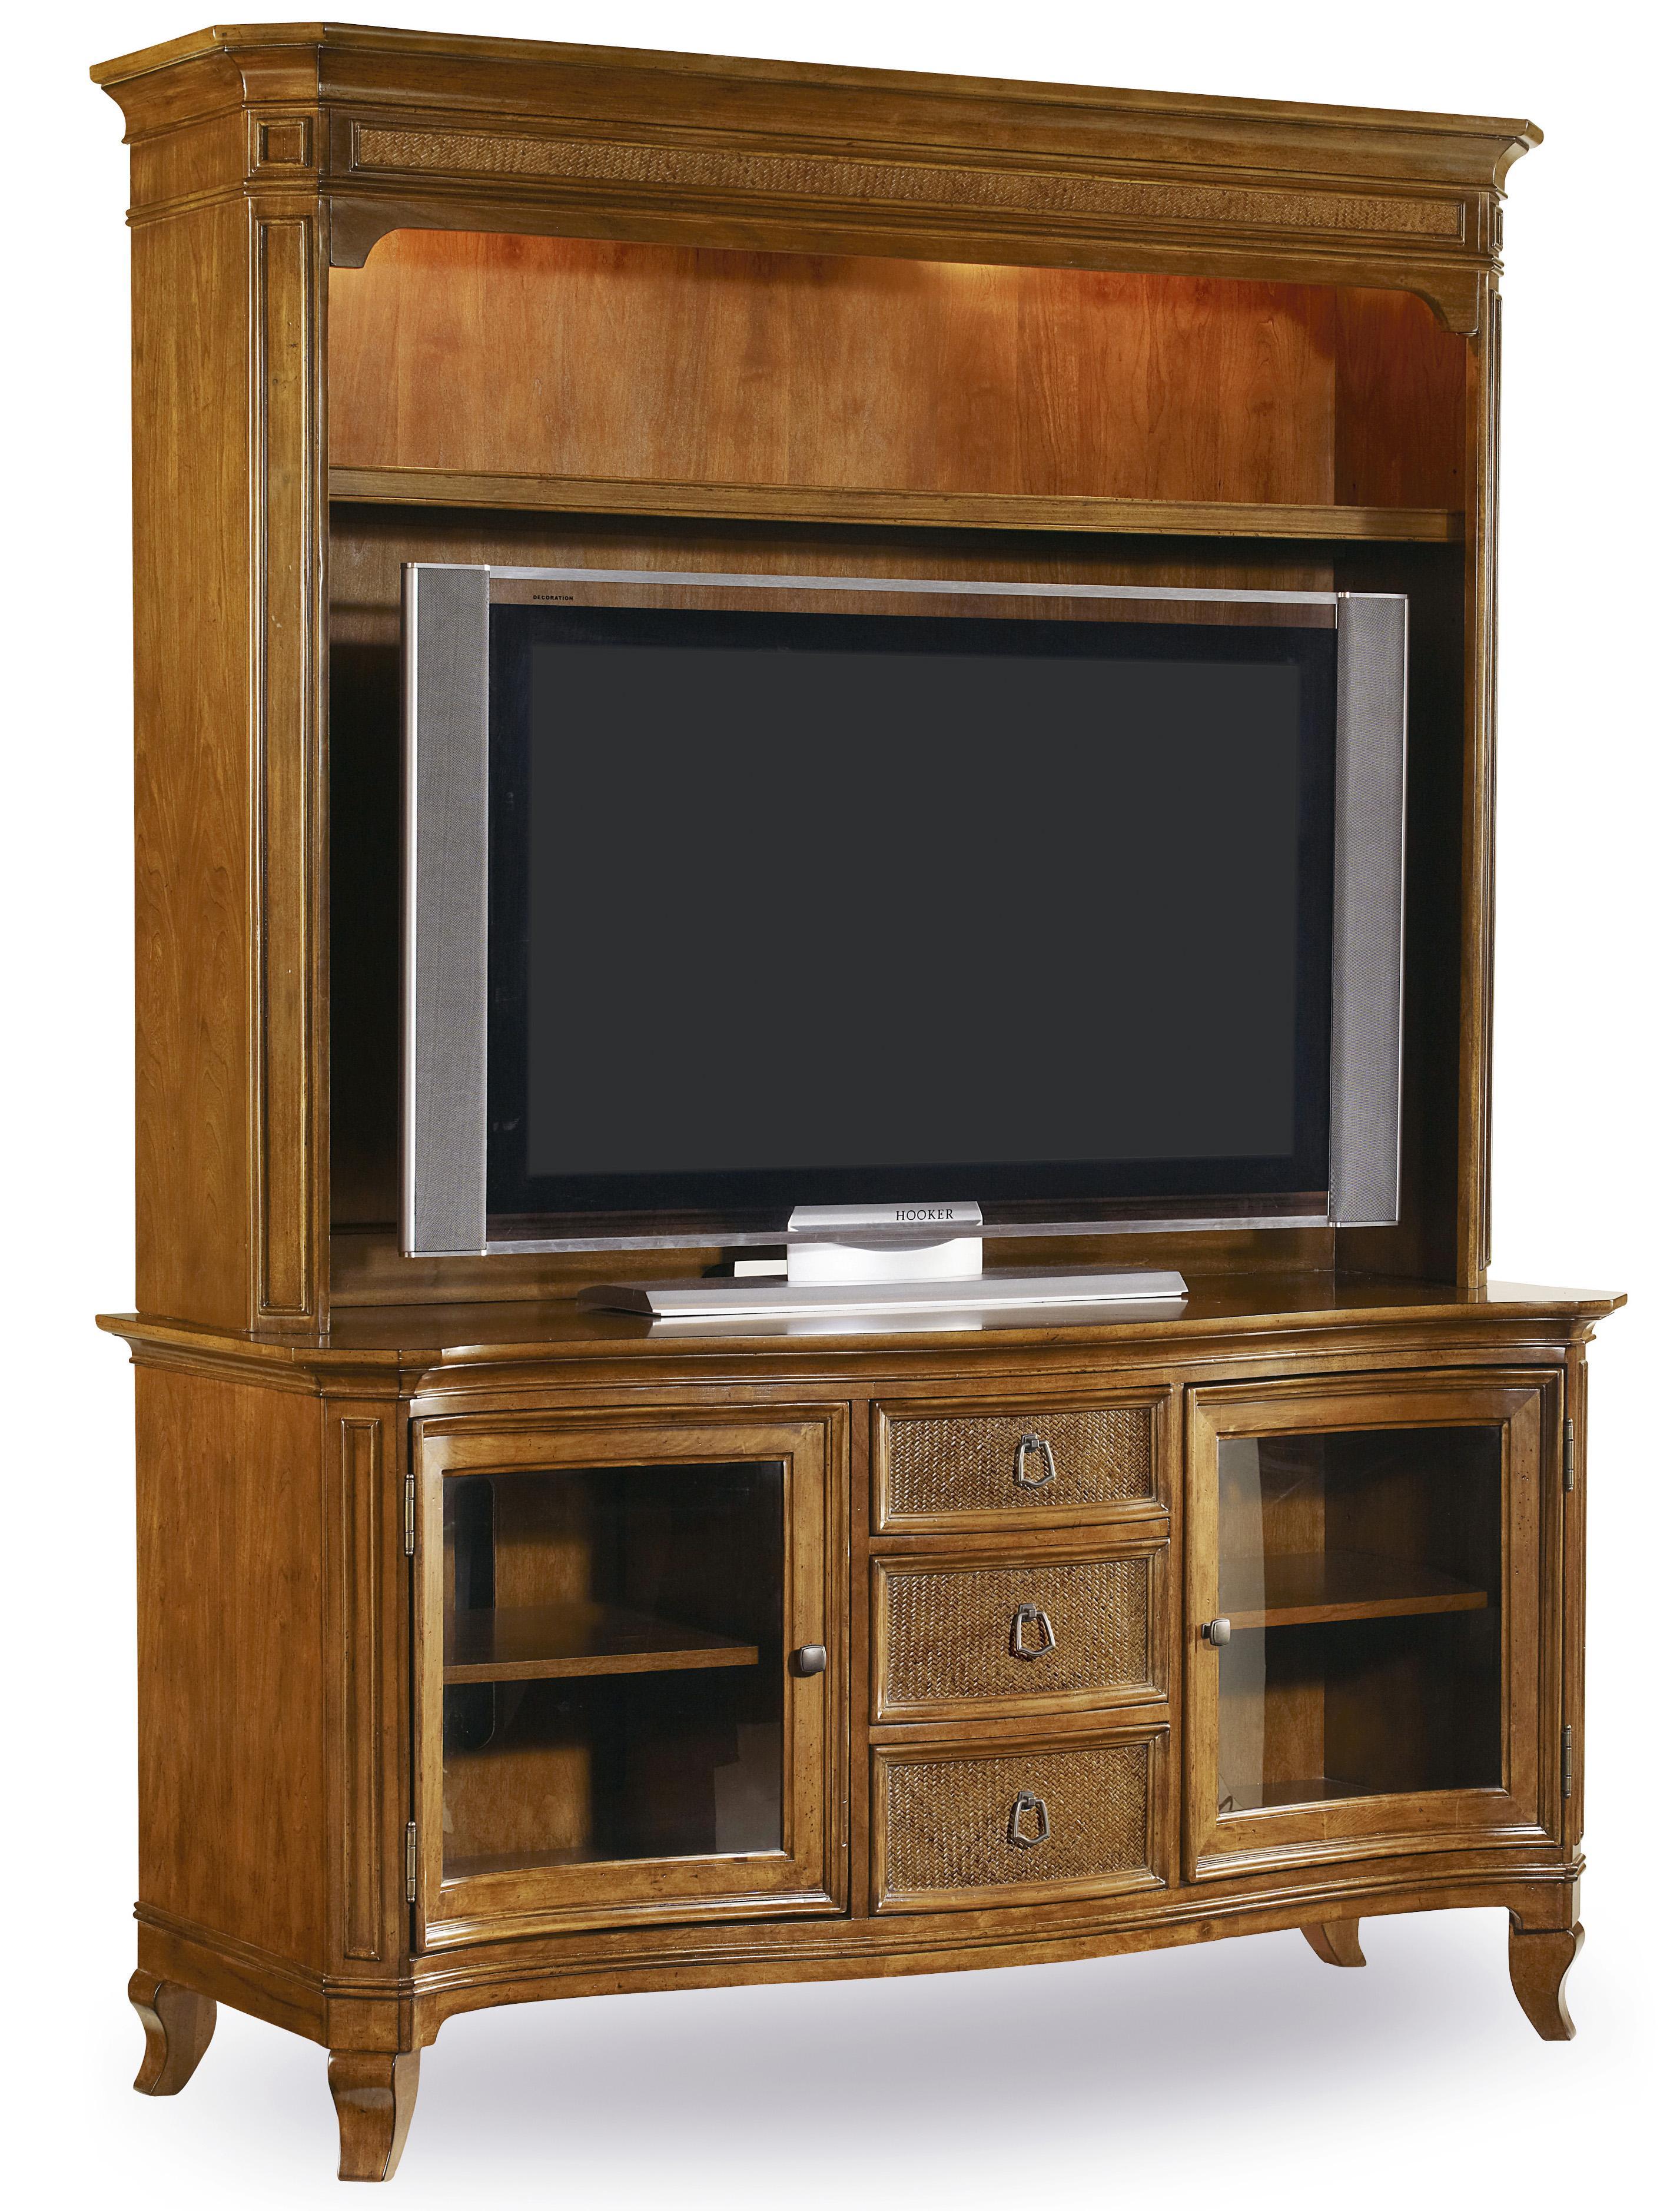 Hooker Furniture Windward Wall Unit - Item Number: 1125-56480+56580